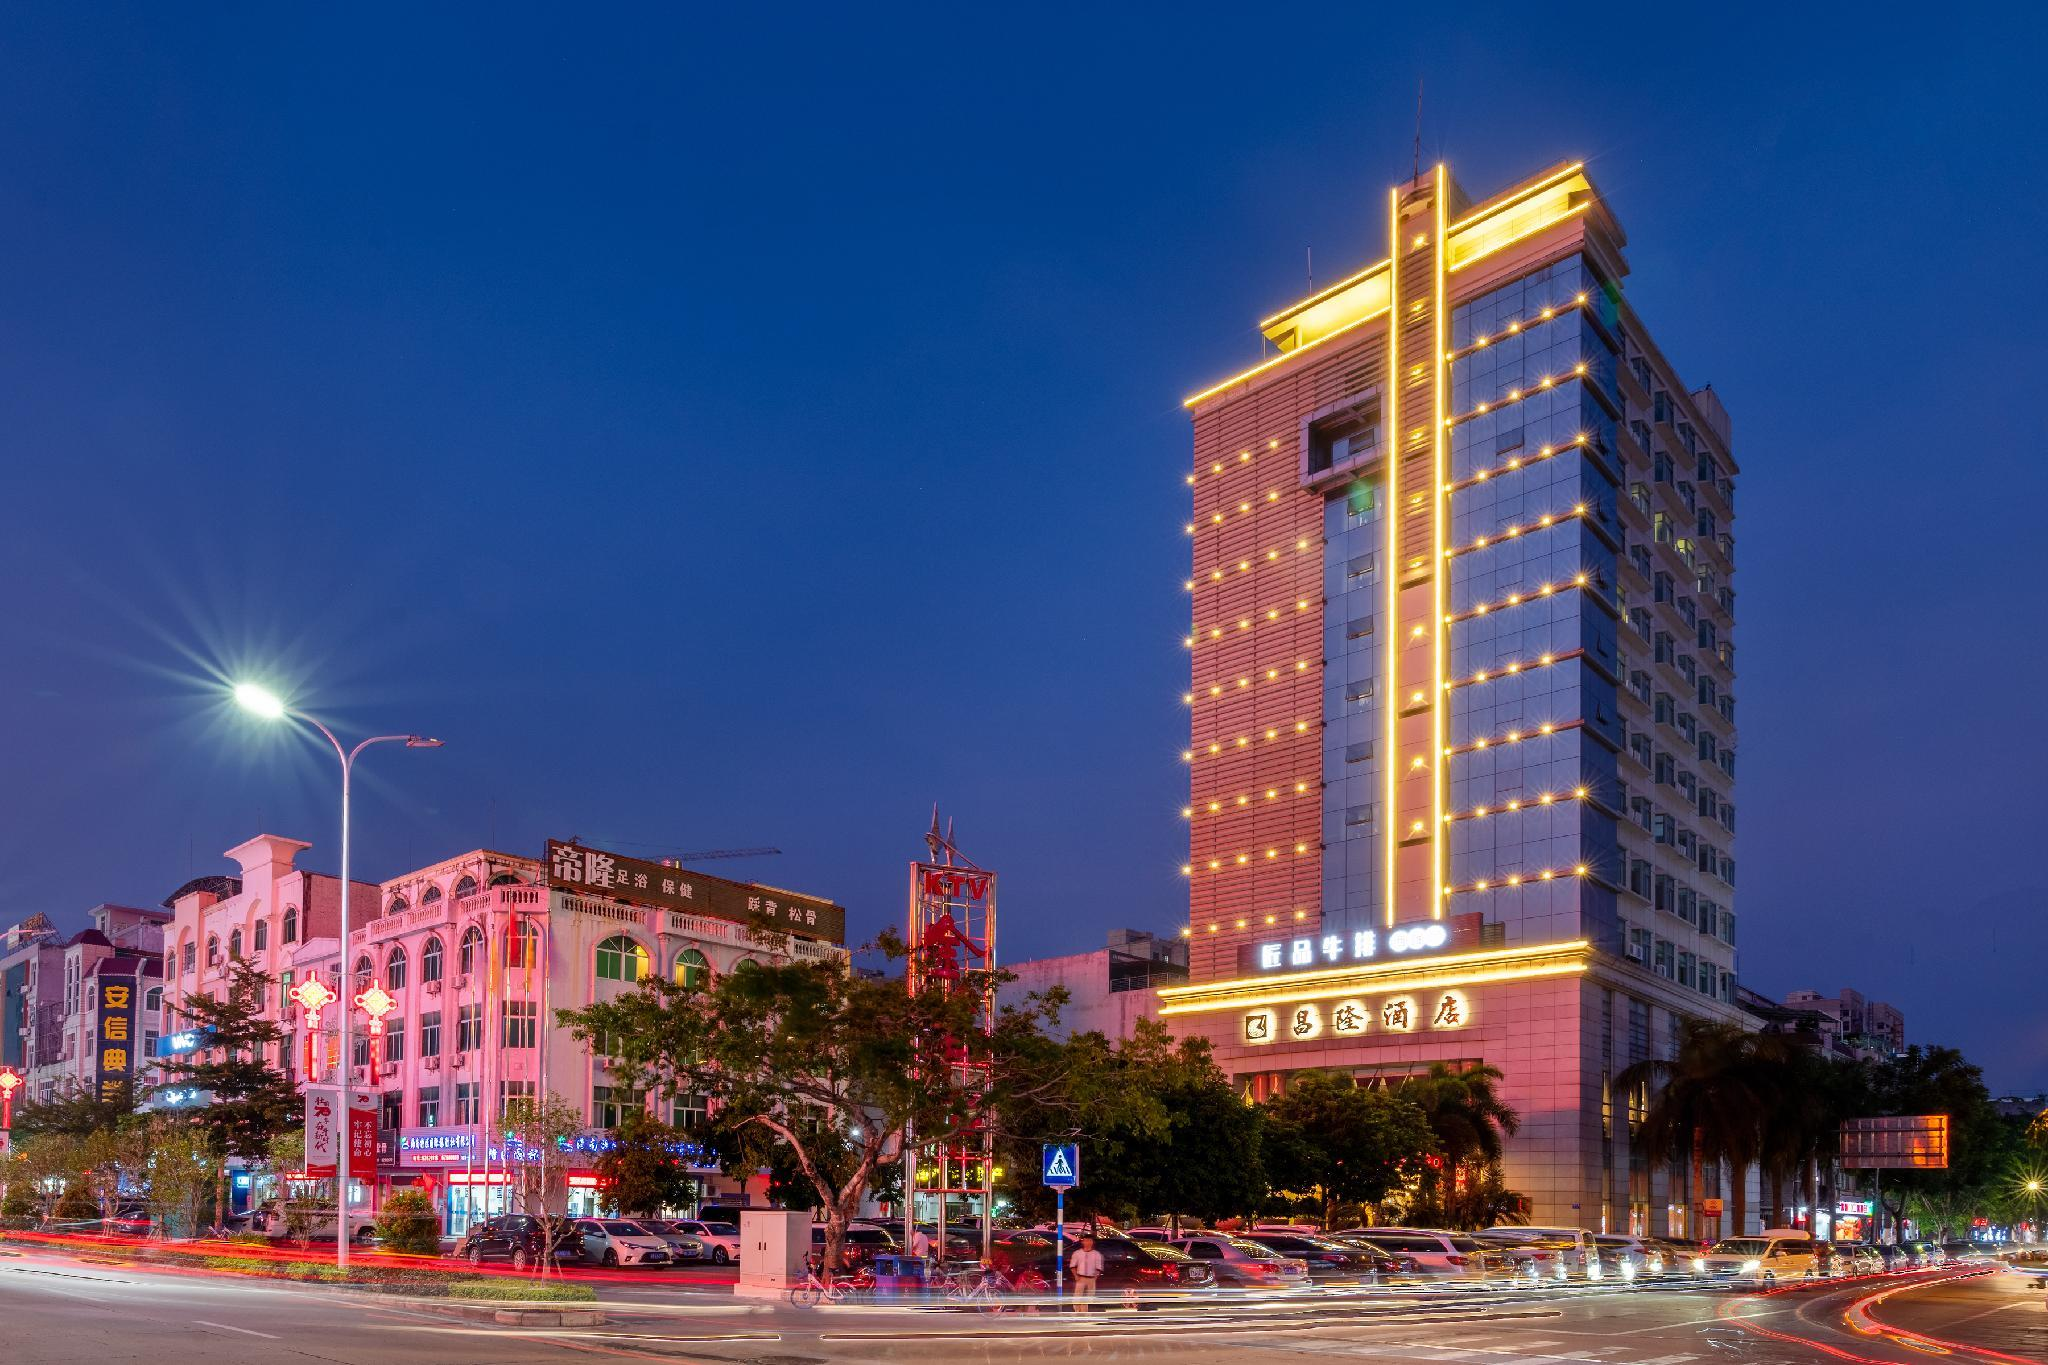 Changlong Hotel Qionghai